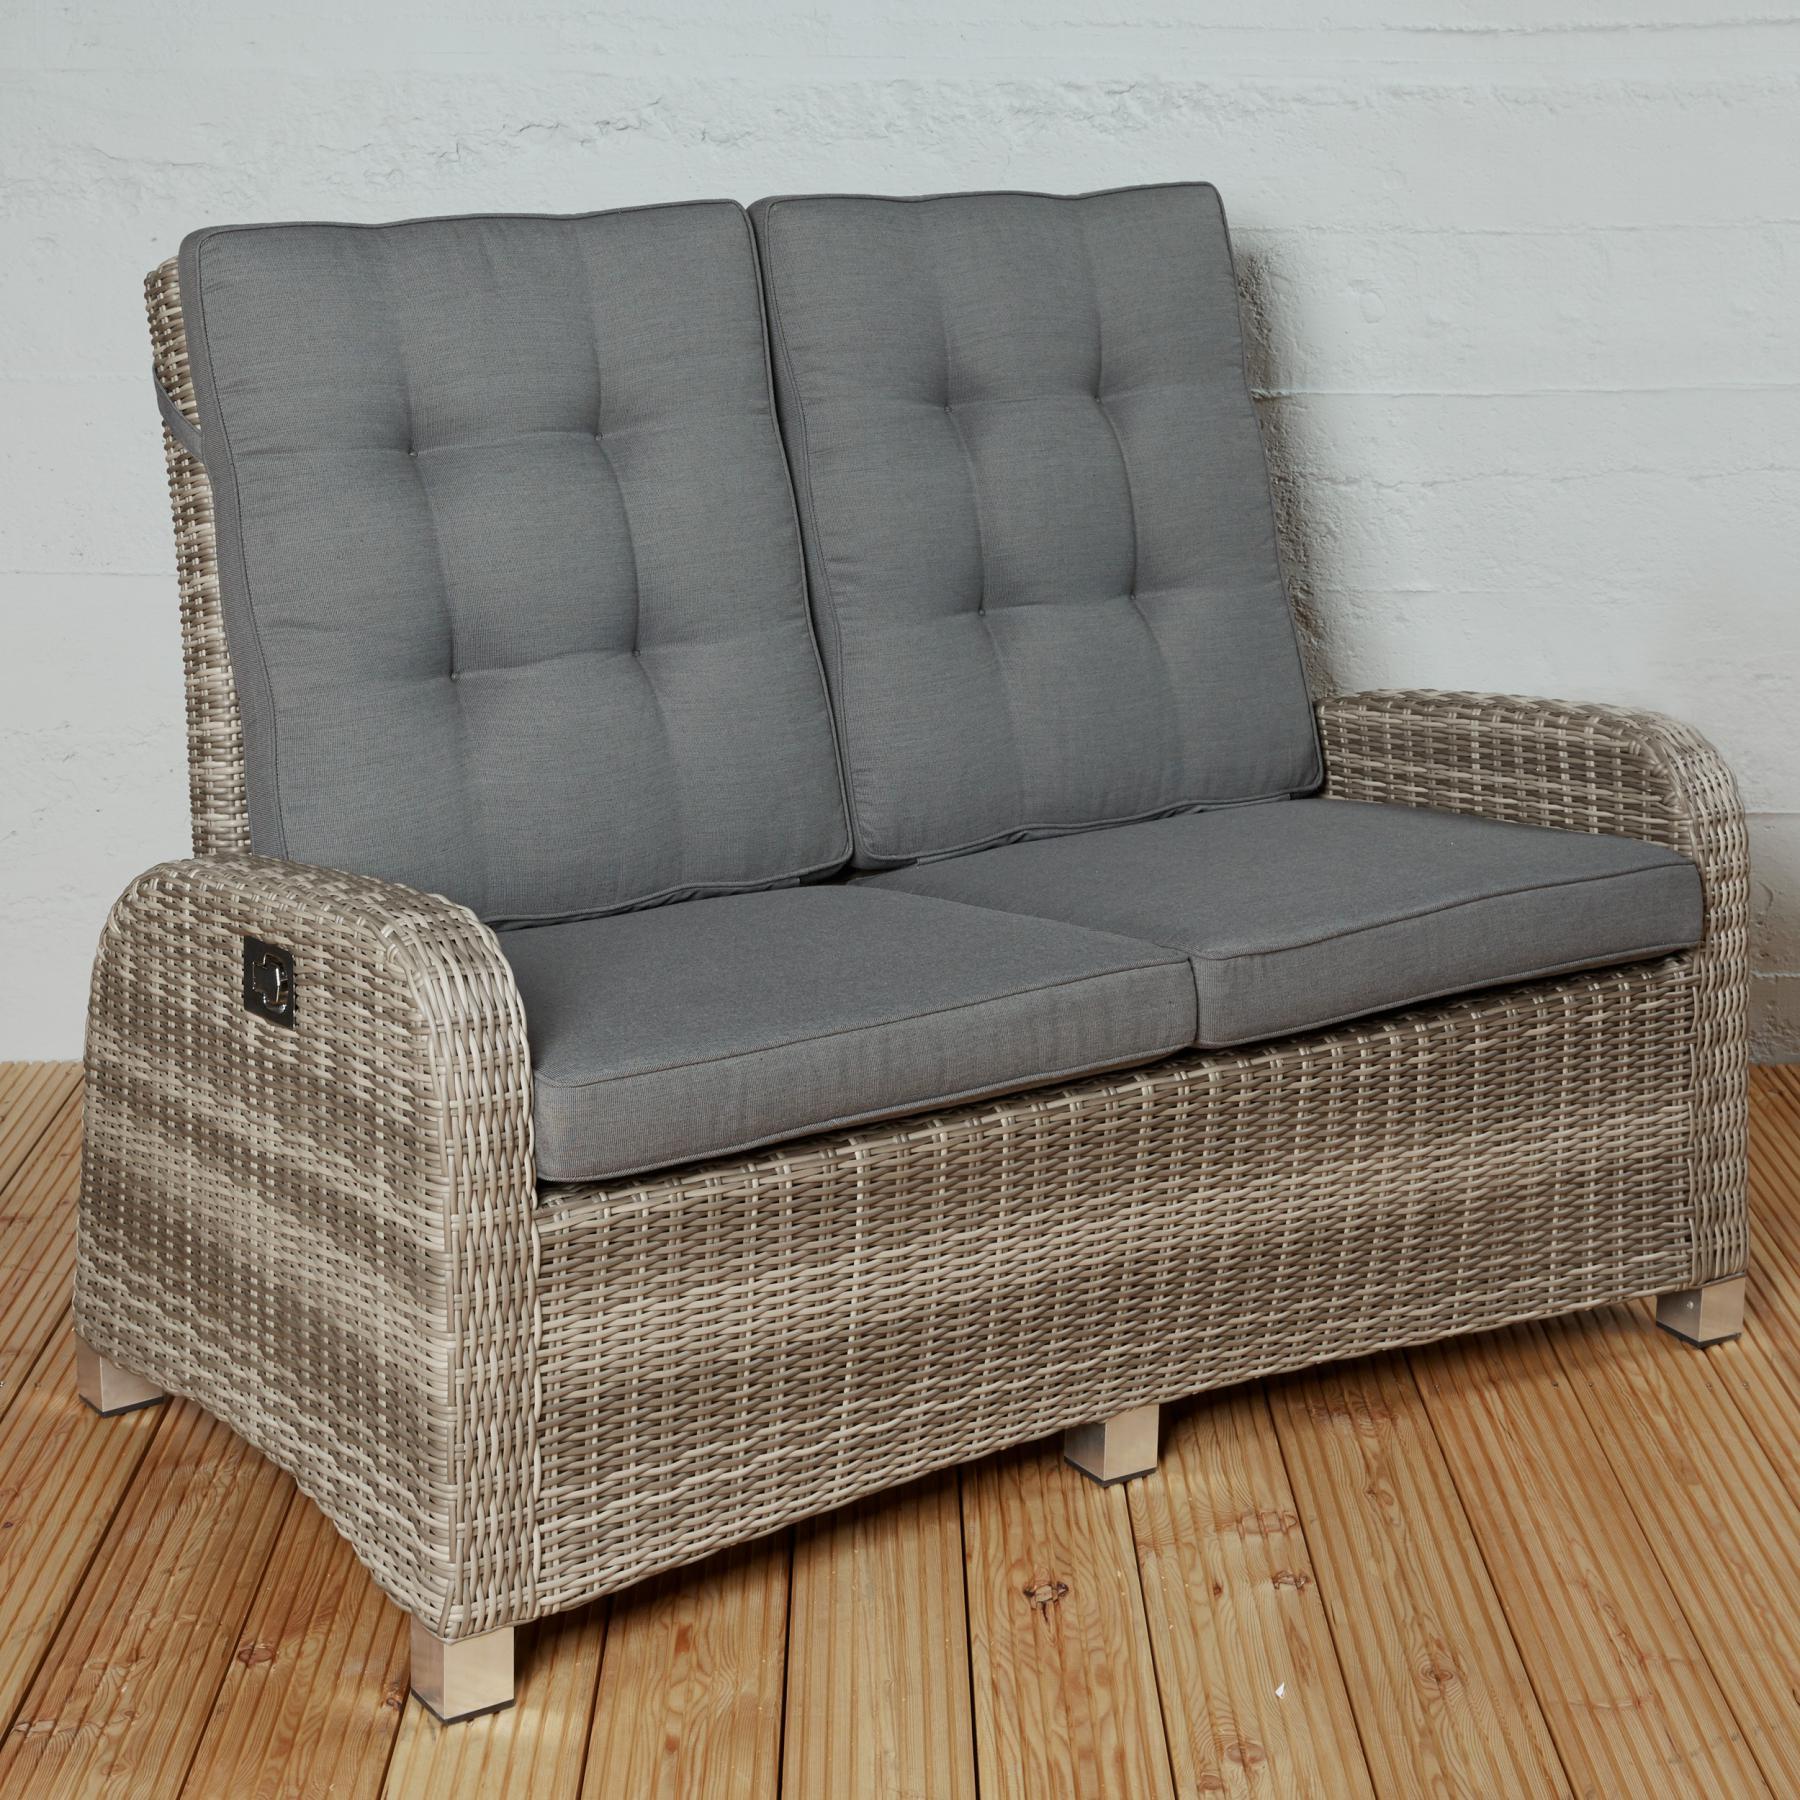 2 sitzer gartensofa rabida champagner loungesofa sofa gartenm bel living sofa polyrattan. Black Bedroom Furniture Sets. Home Design Ideas